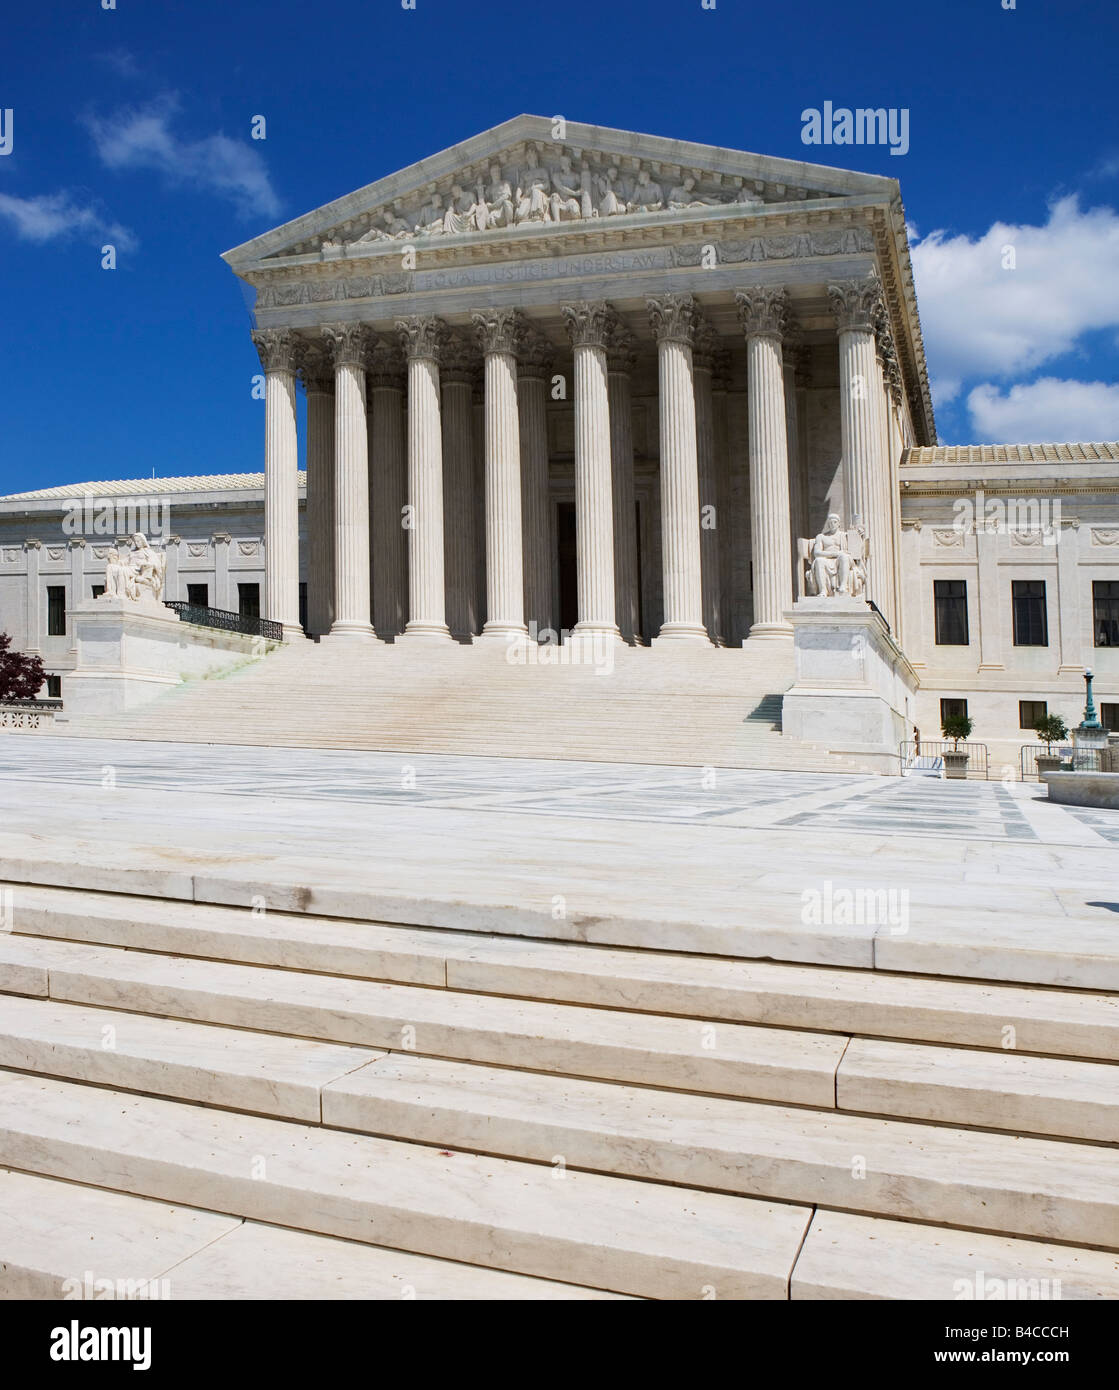 washington, washington, dc, district, of, columbia, nations, capital, nations, capitol, capital, supreme court building Stock Photo